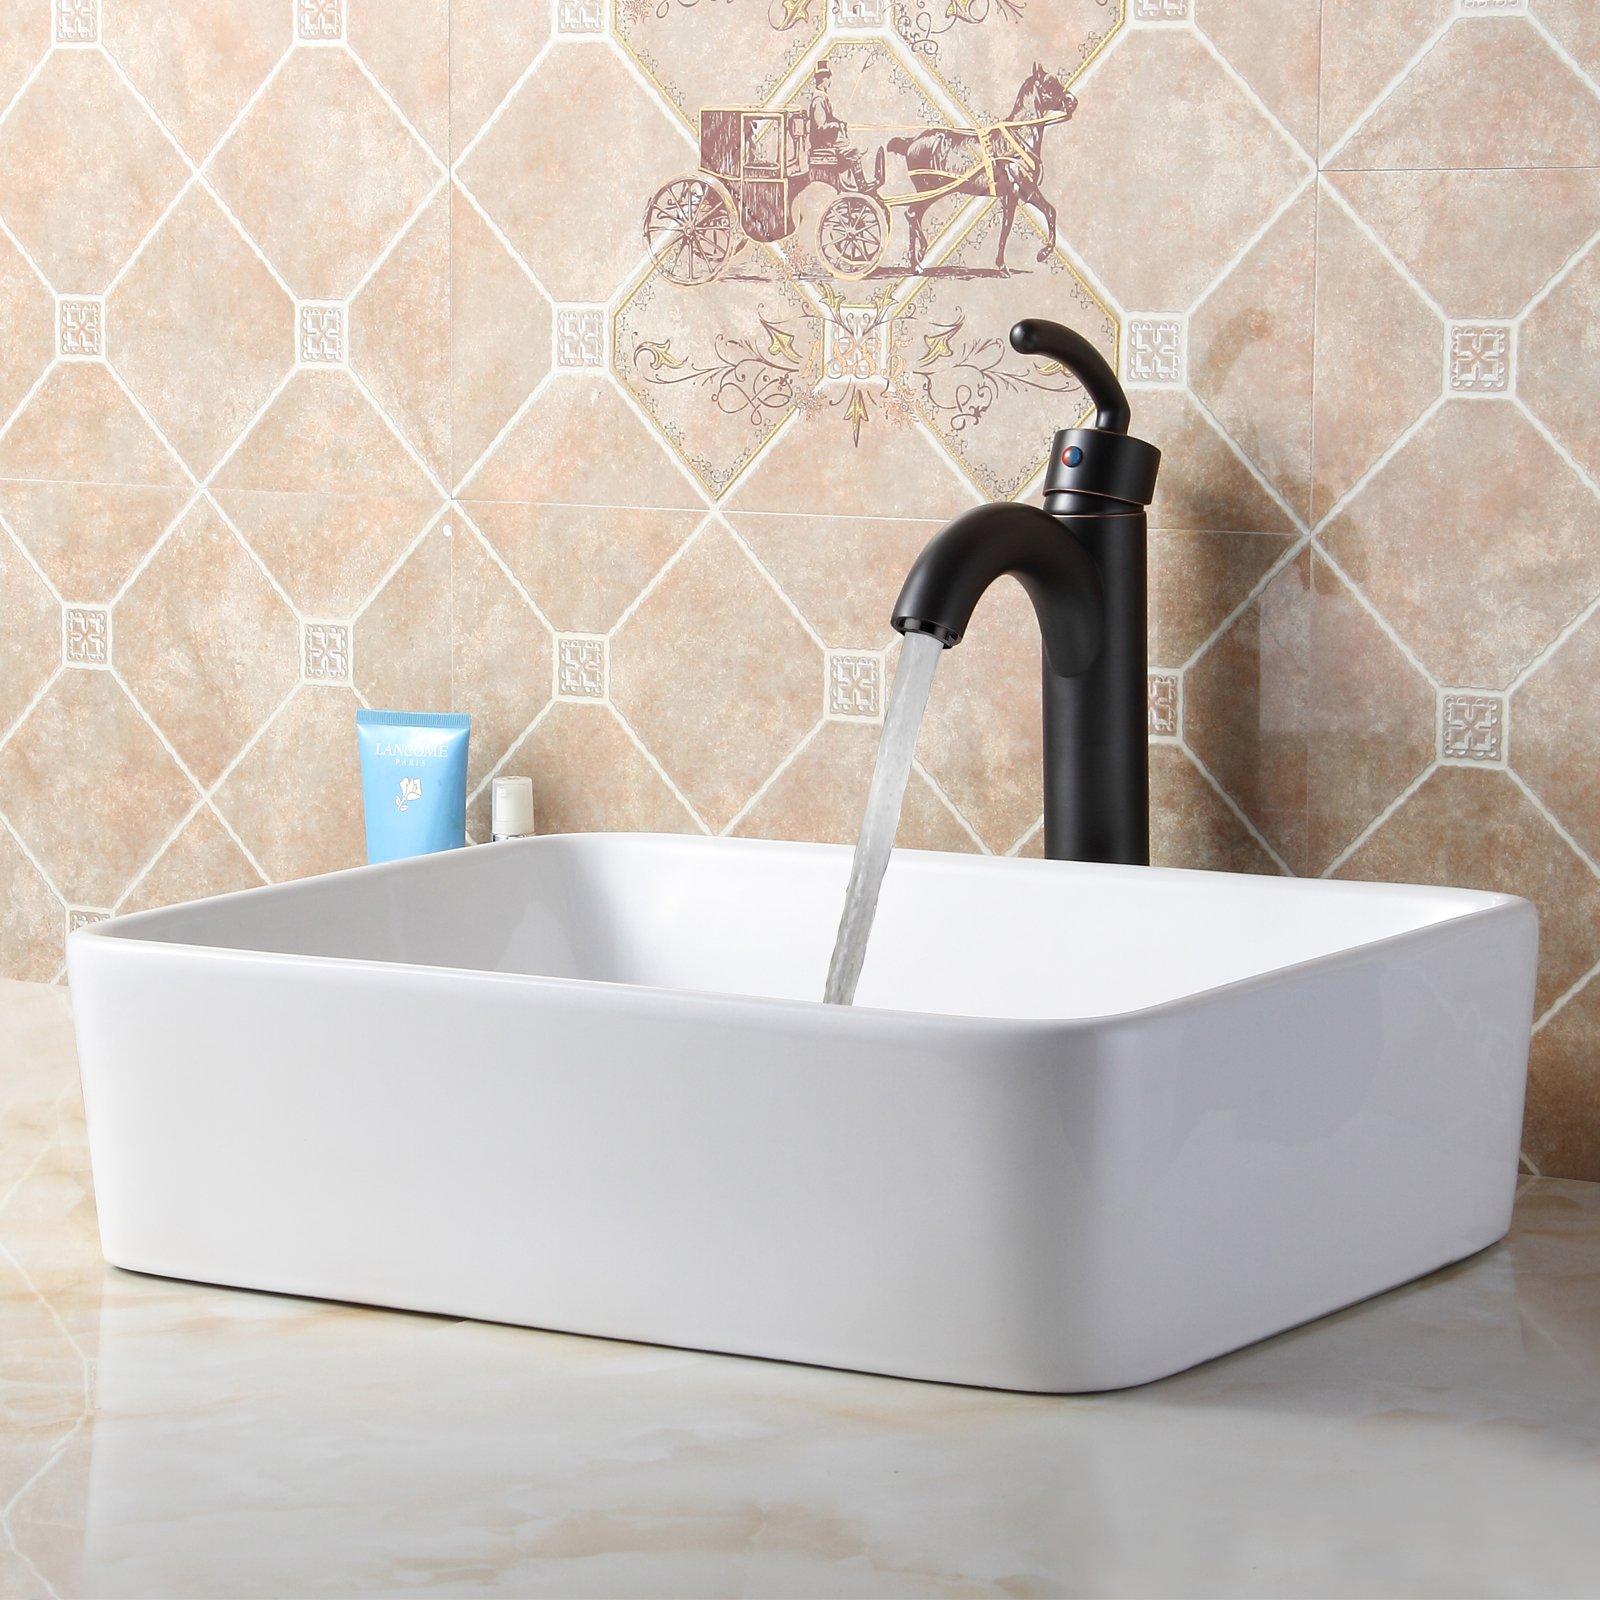 ELITE Bathroom Rectangle White Ceramic Porcelain Vessel Sink & Oil Rubbed Bronze Faucet